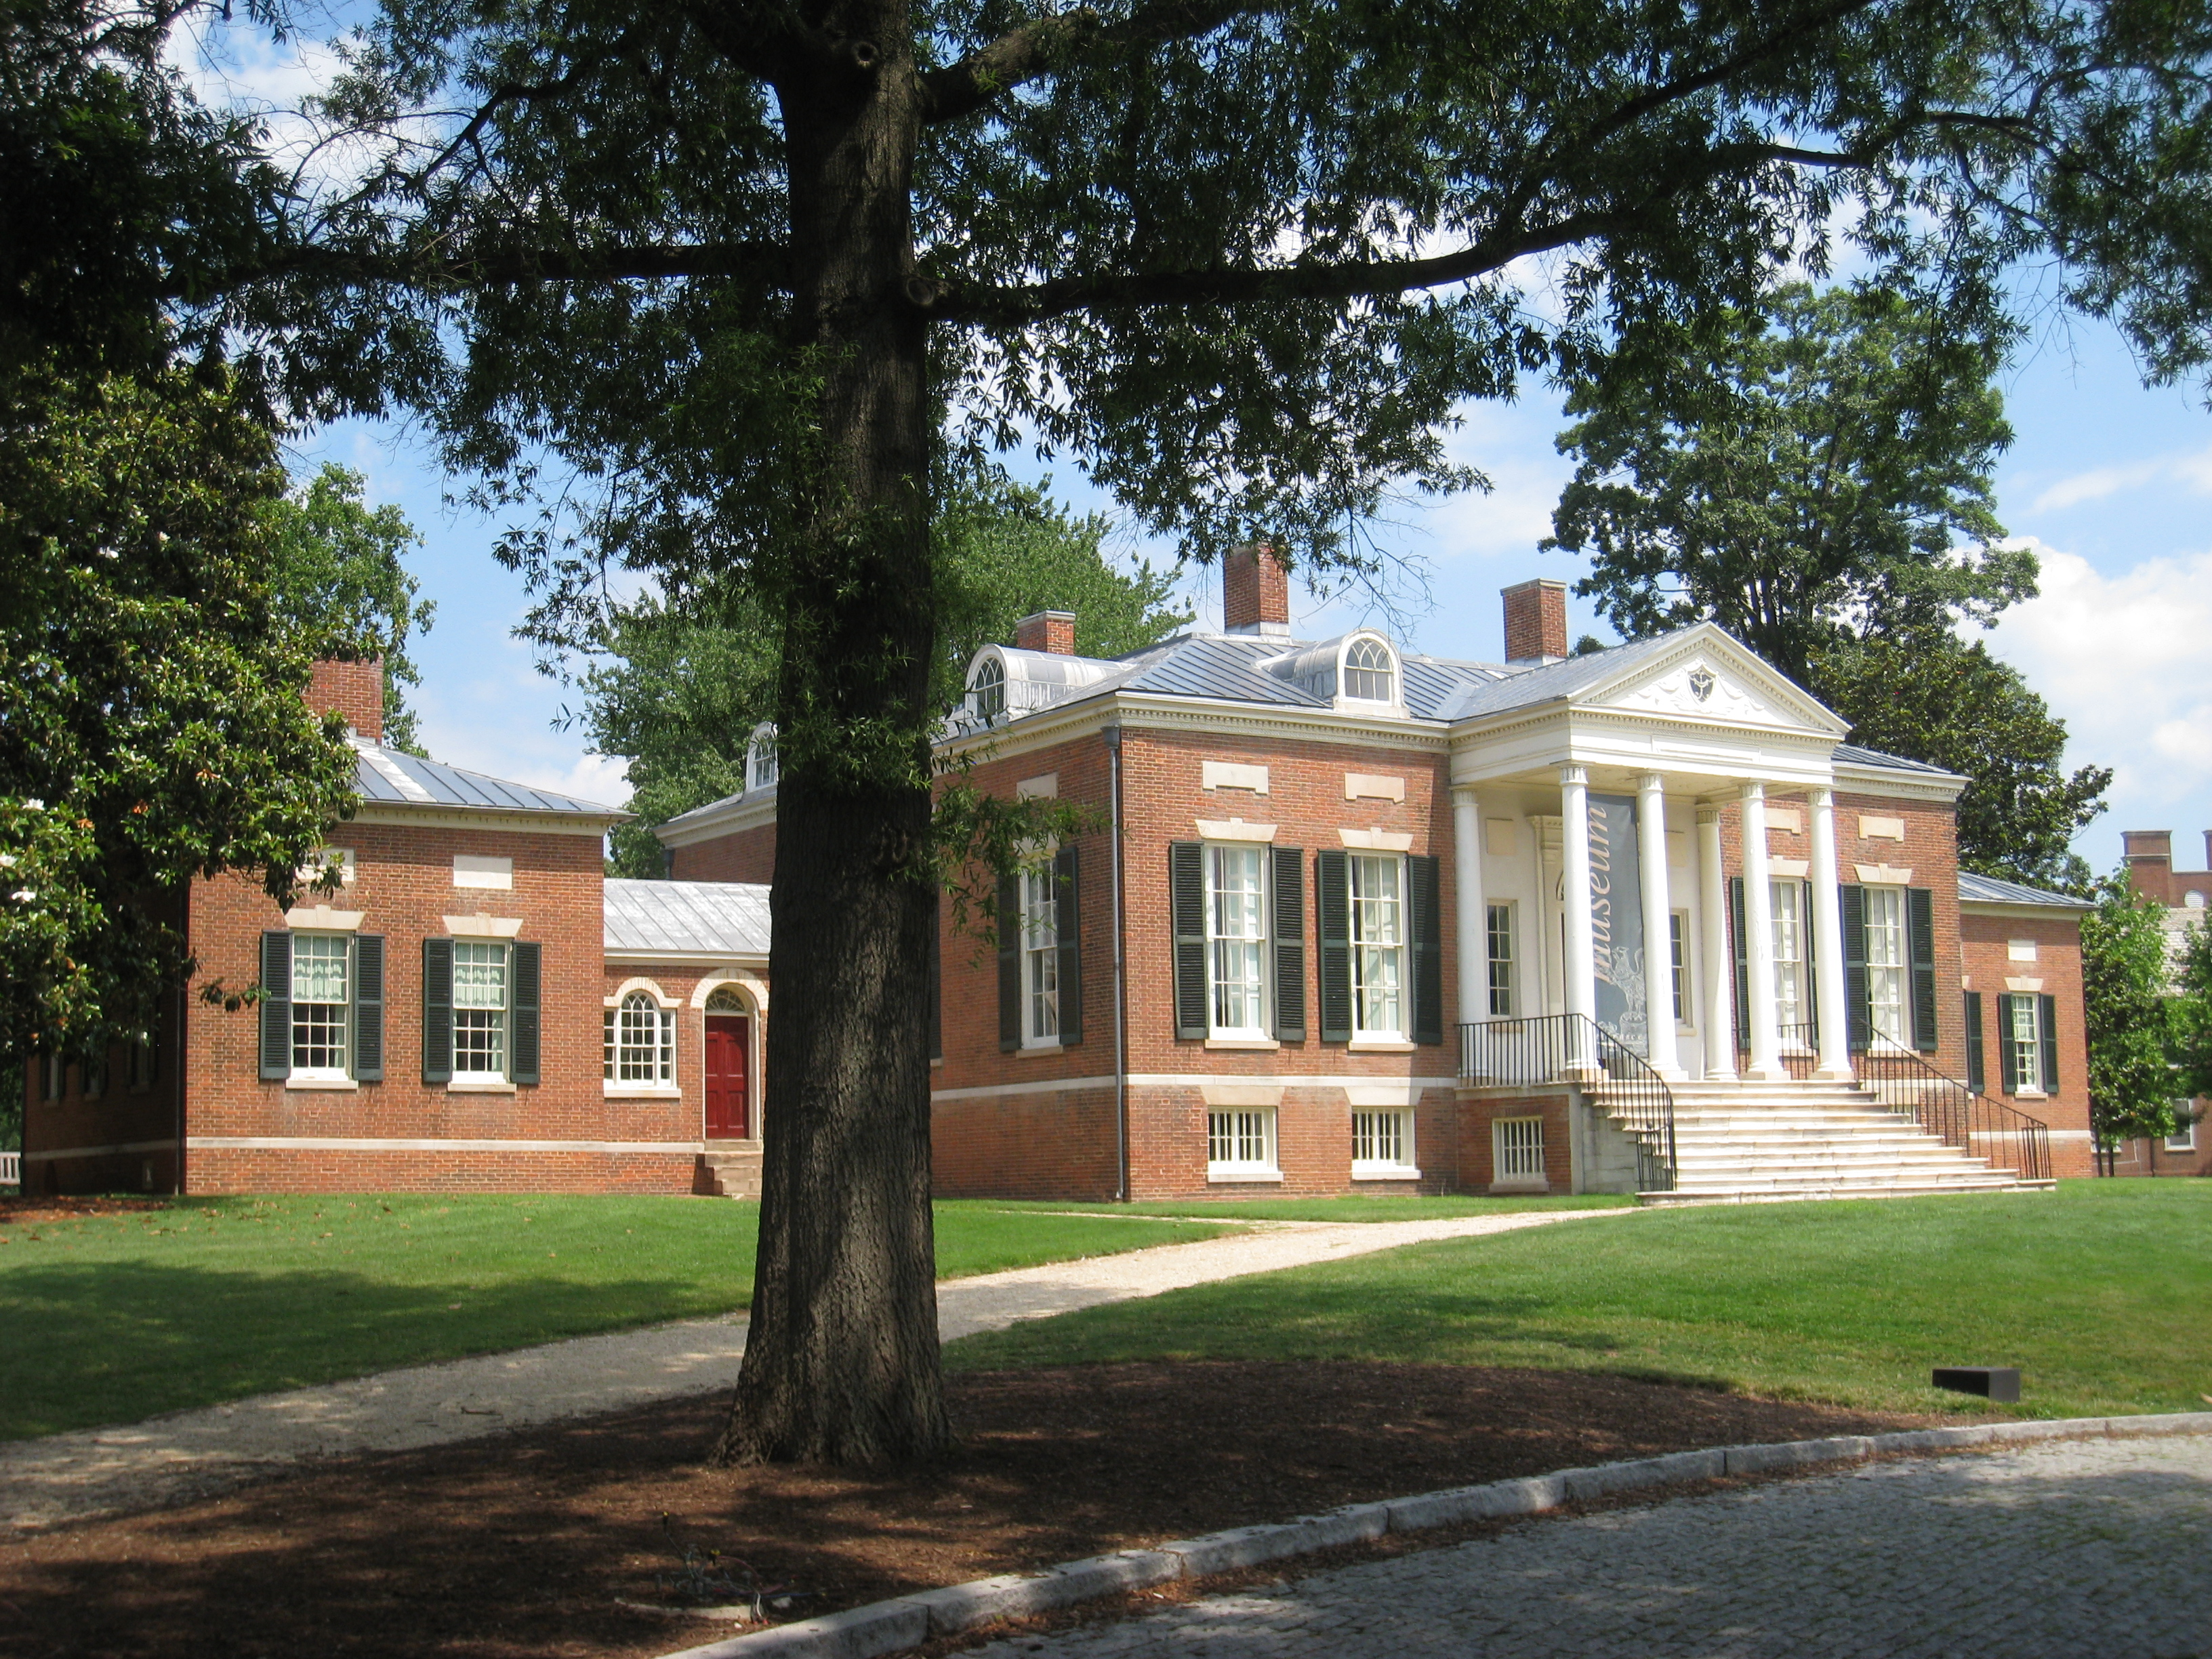 Home university of maryland baltimore - File Homewood Museum Johns Hopkins University Baltimore Md Jpg